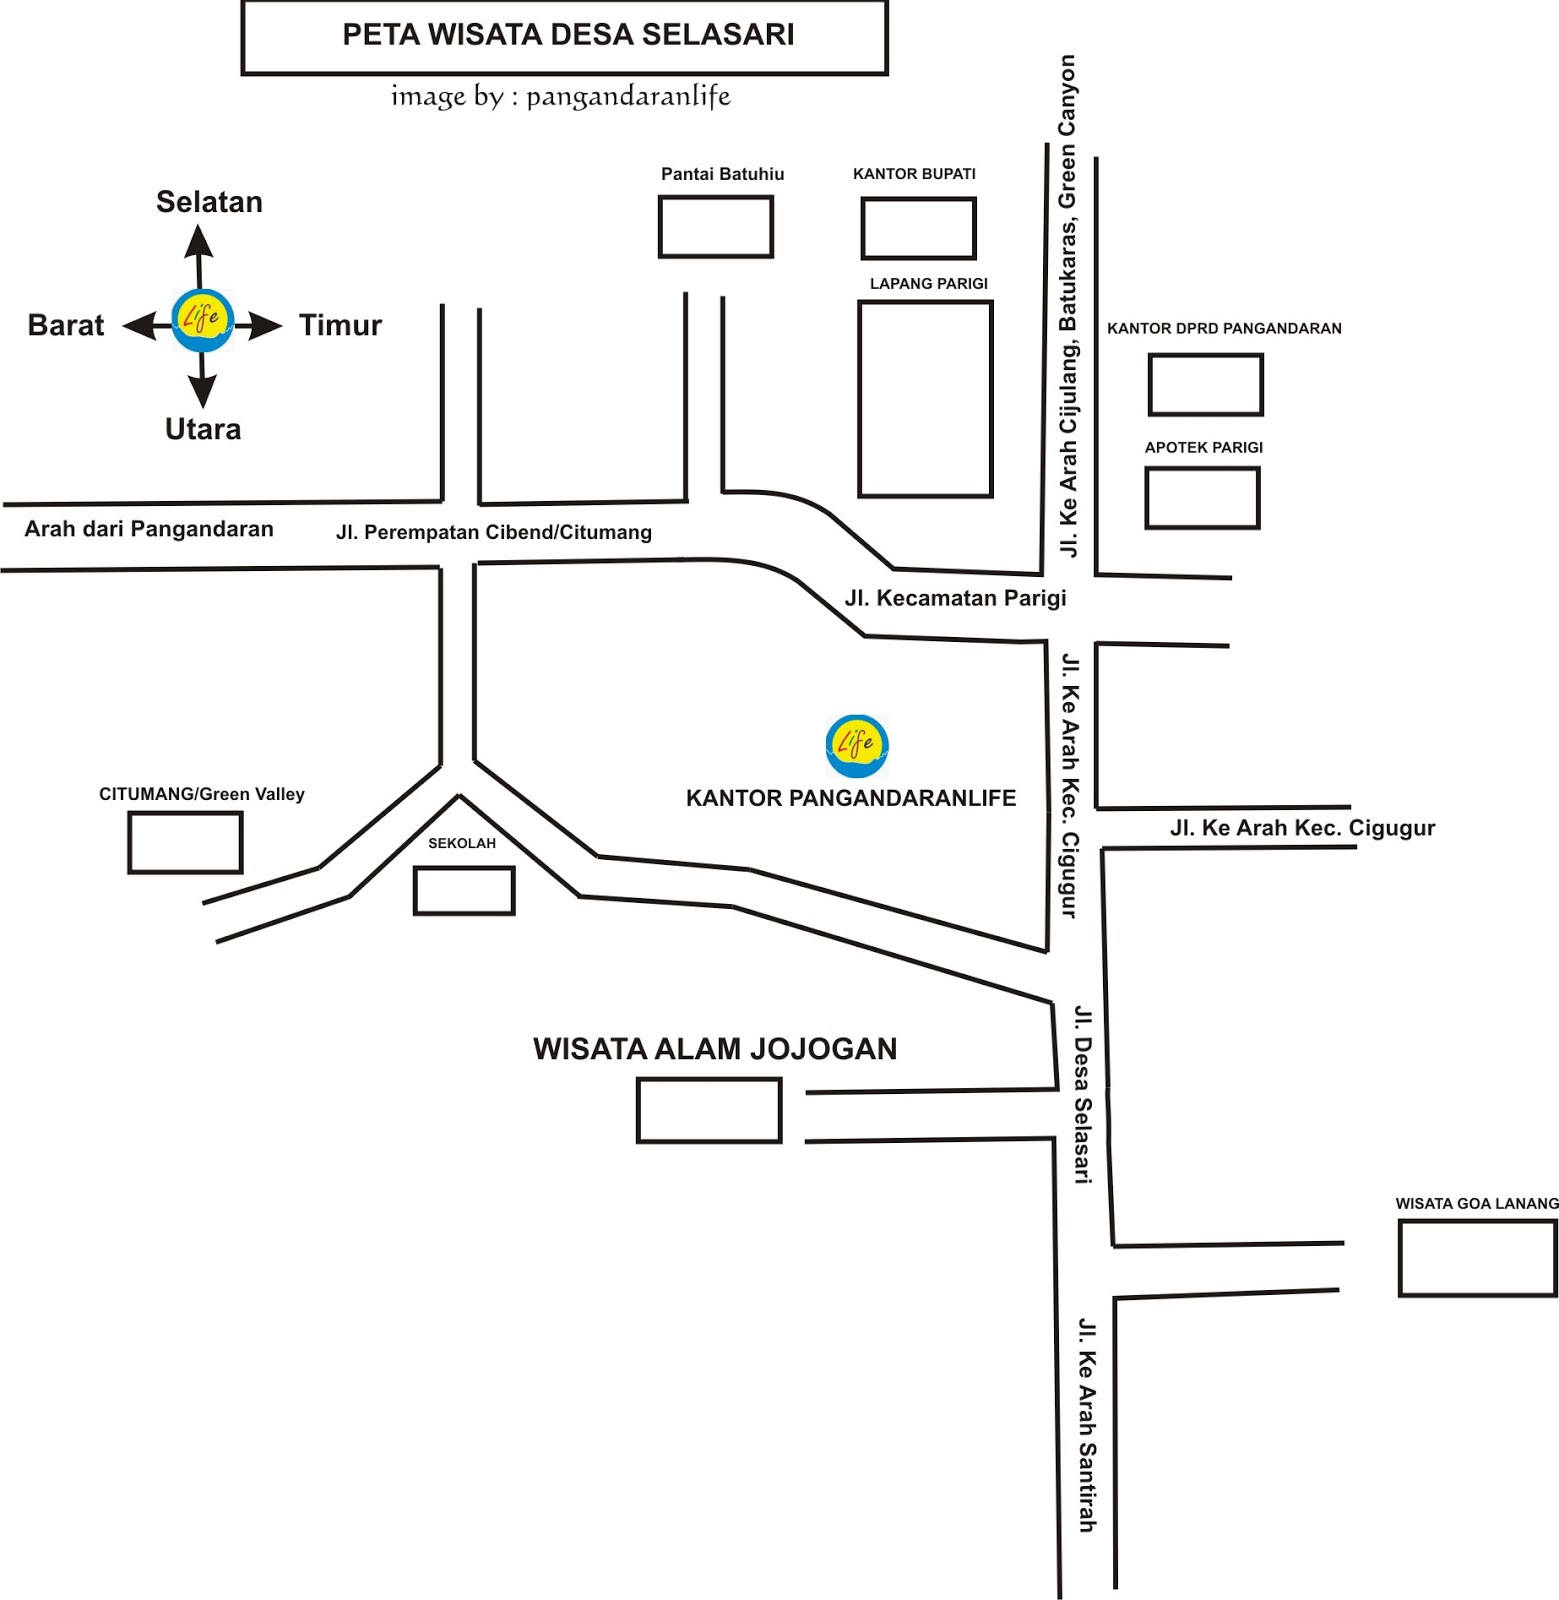 peta wisata desa selasari Kab. Pangandaran